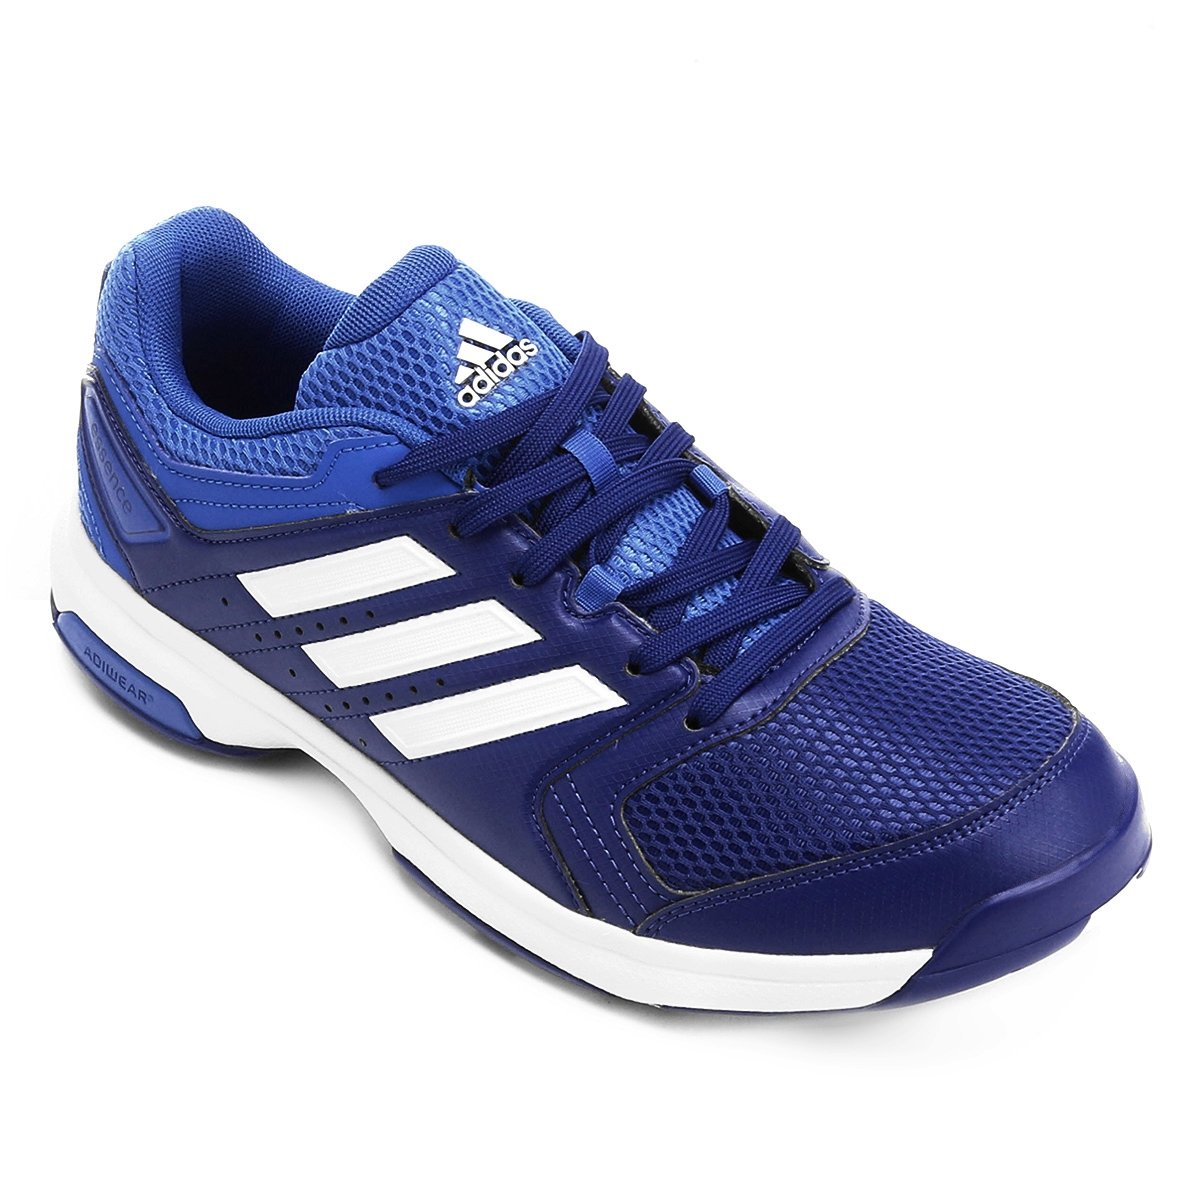 e8af21374 Tênis Masculino Adidas Essence BY2448 Azul Branco